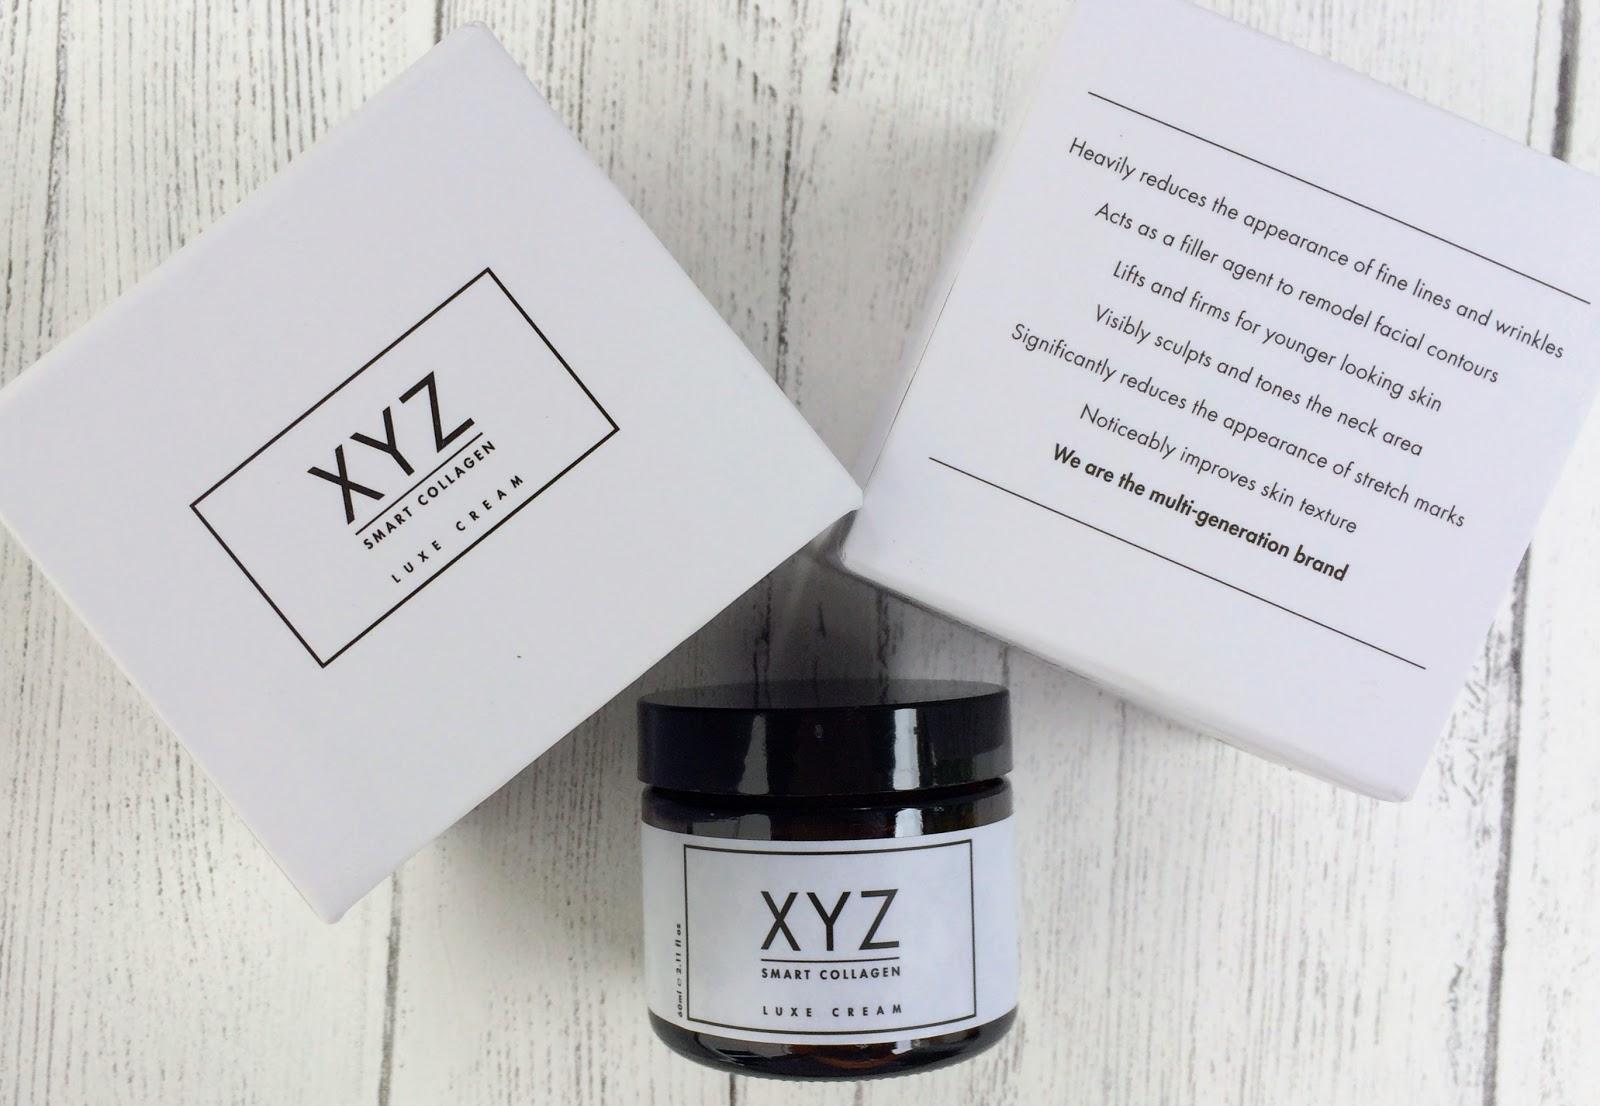 XYZ smart collagen pot and box